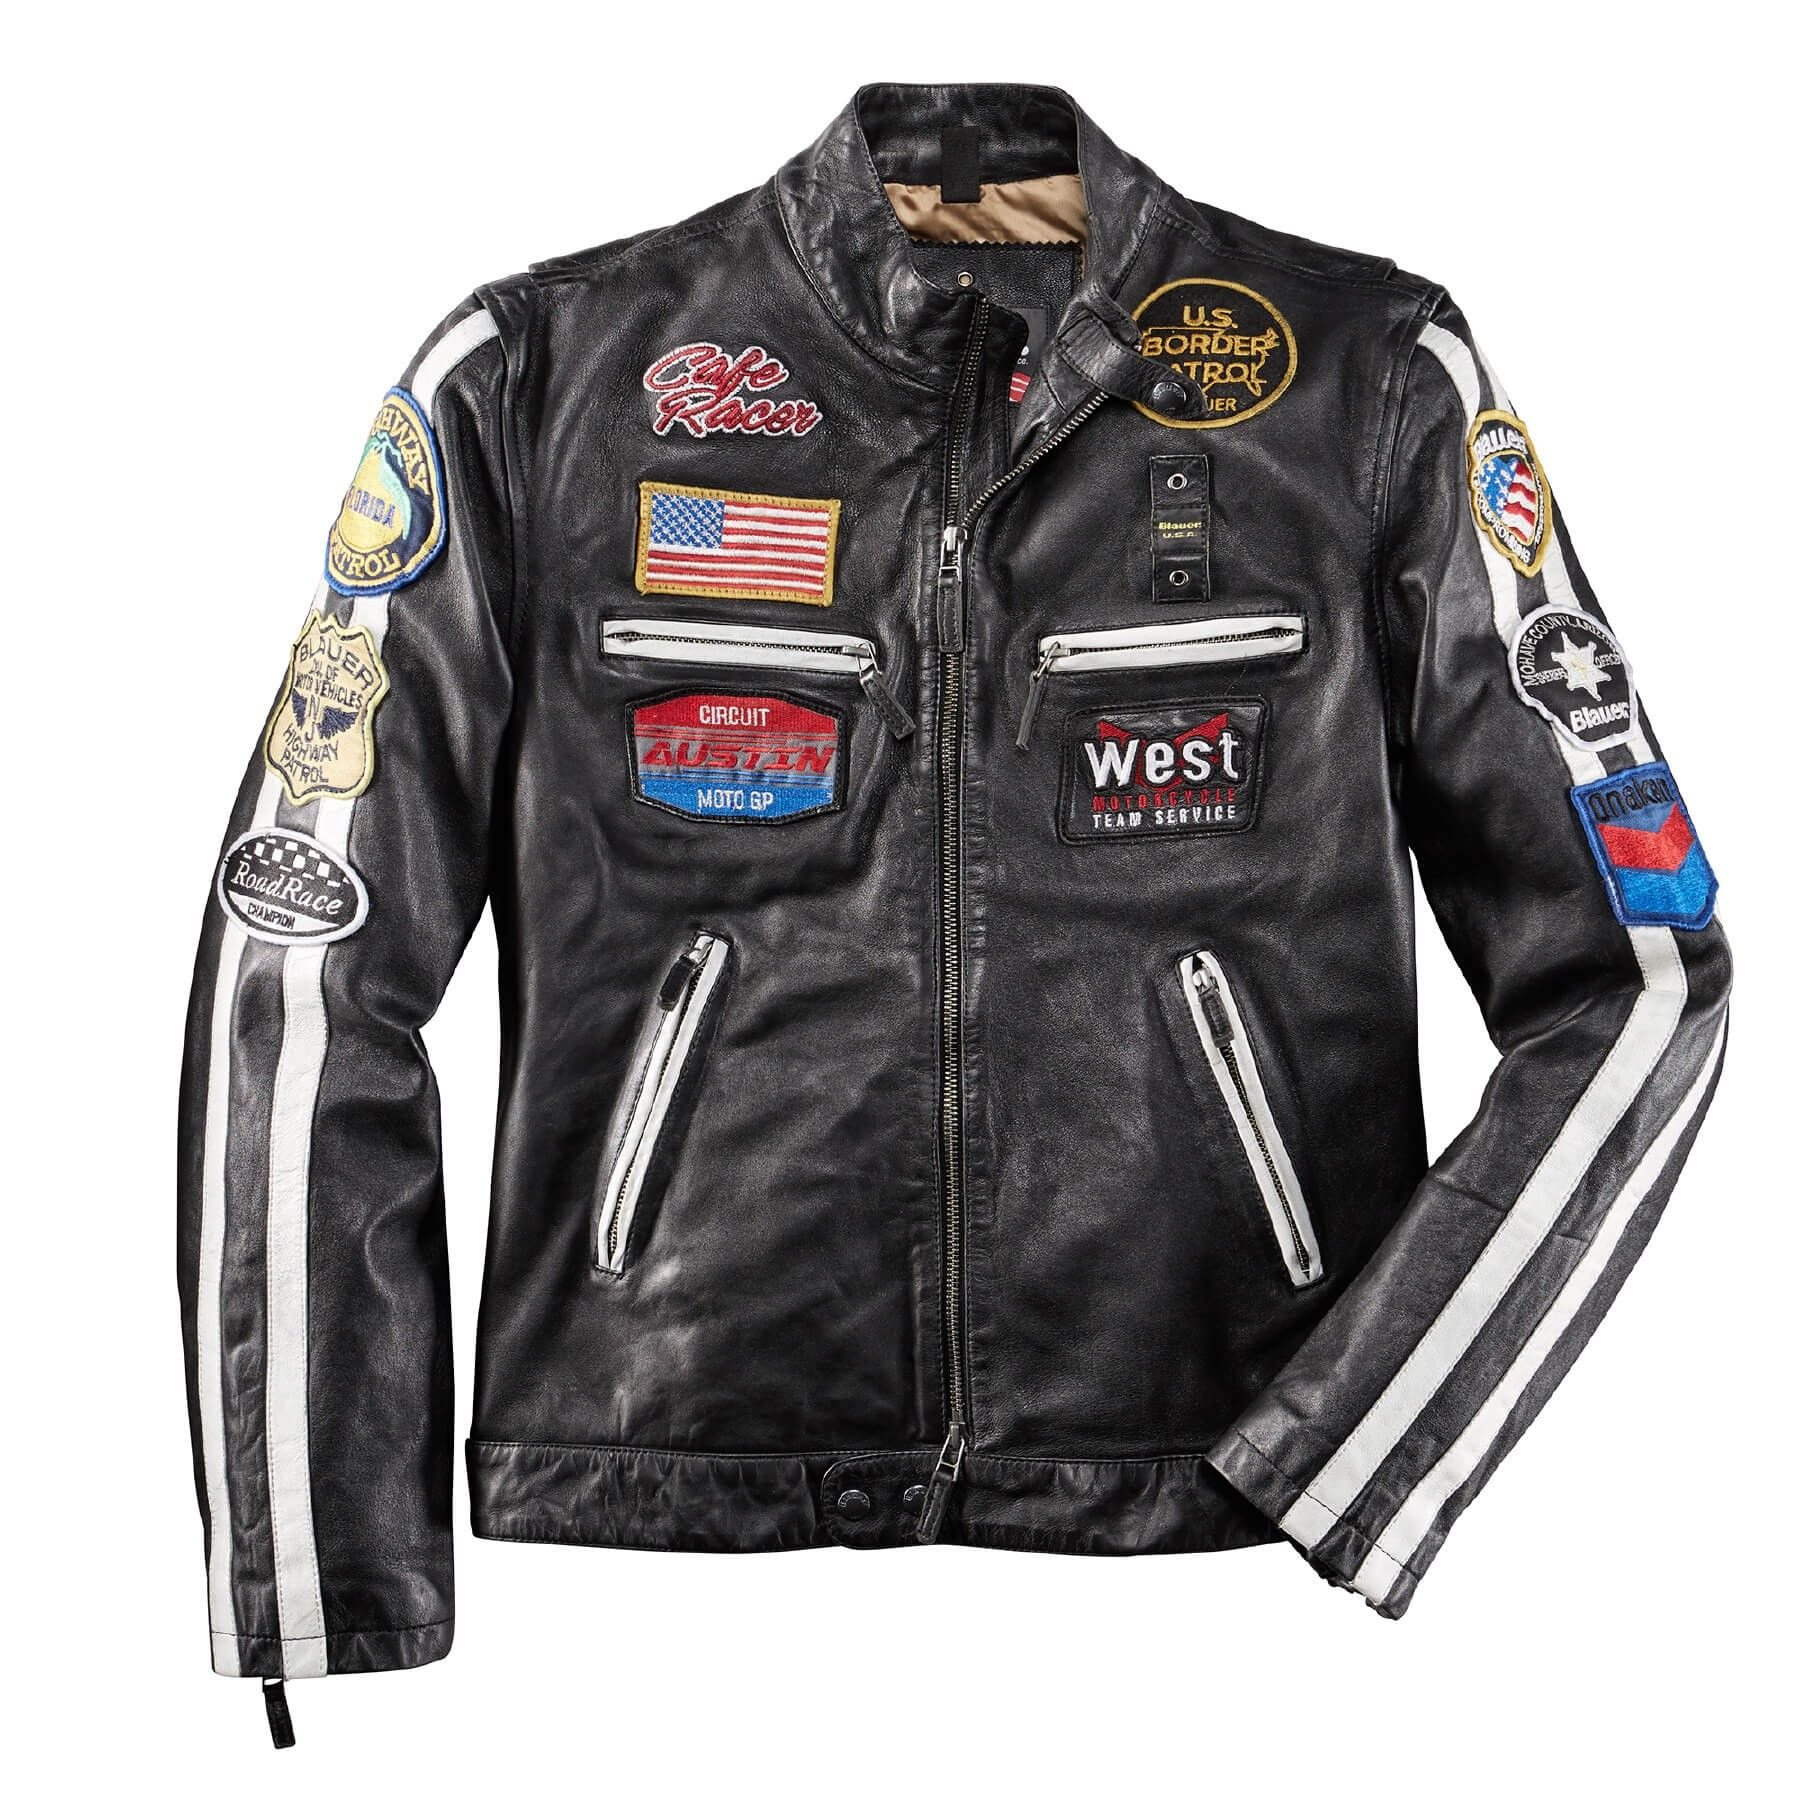 Blauer USA Lederjacke American Rider Blauer USA in 2019